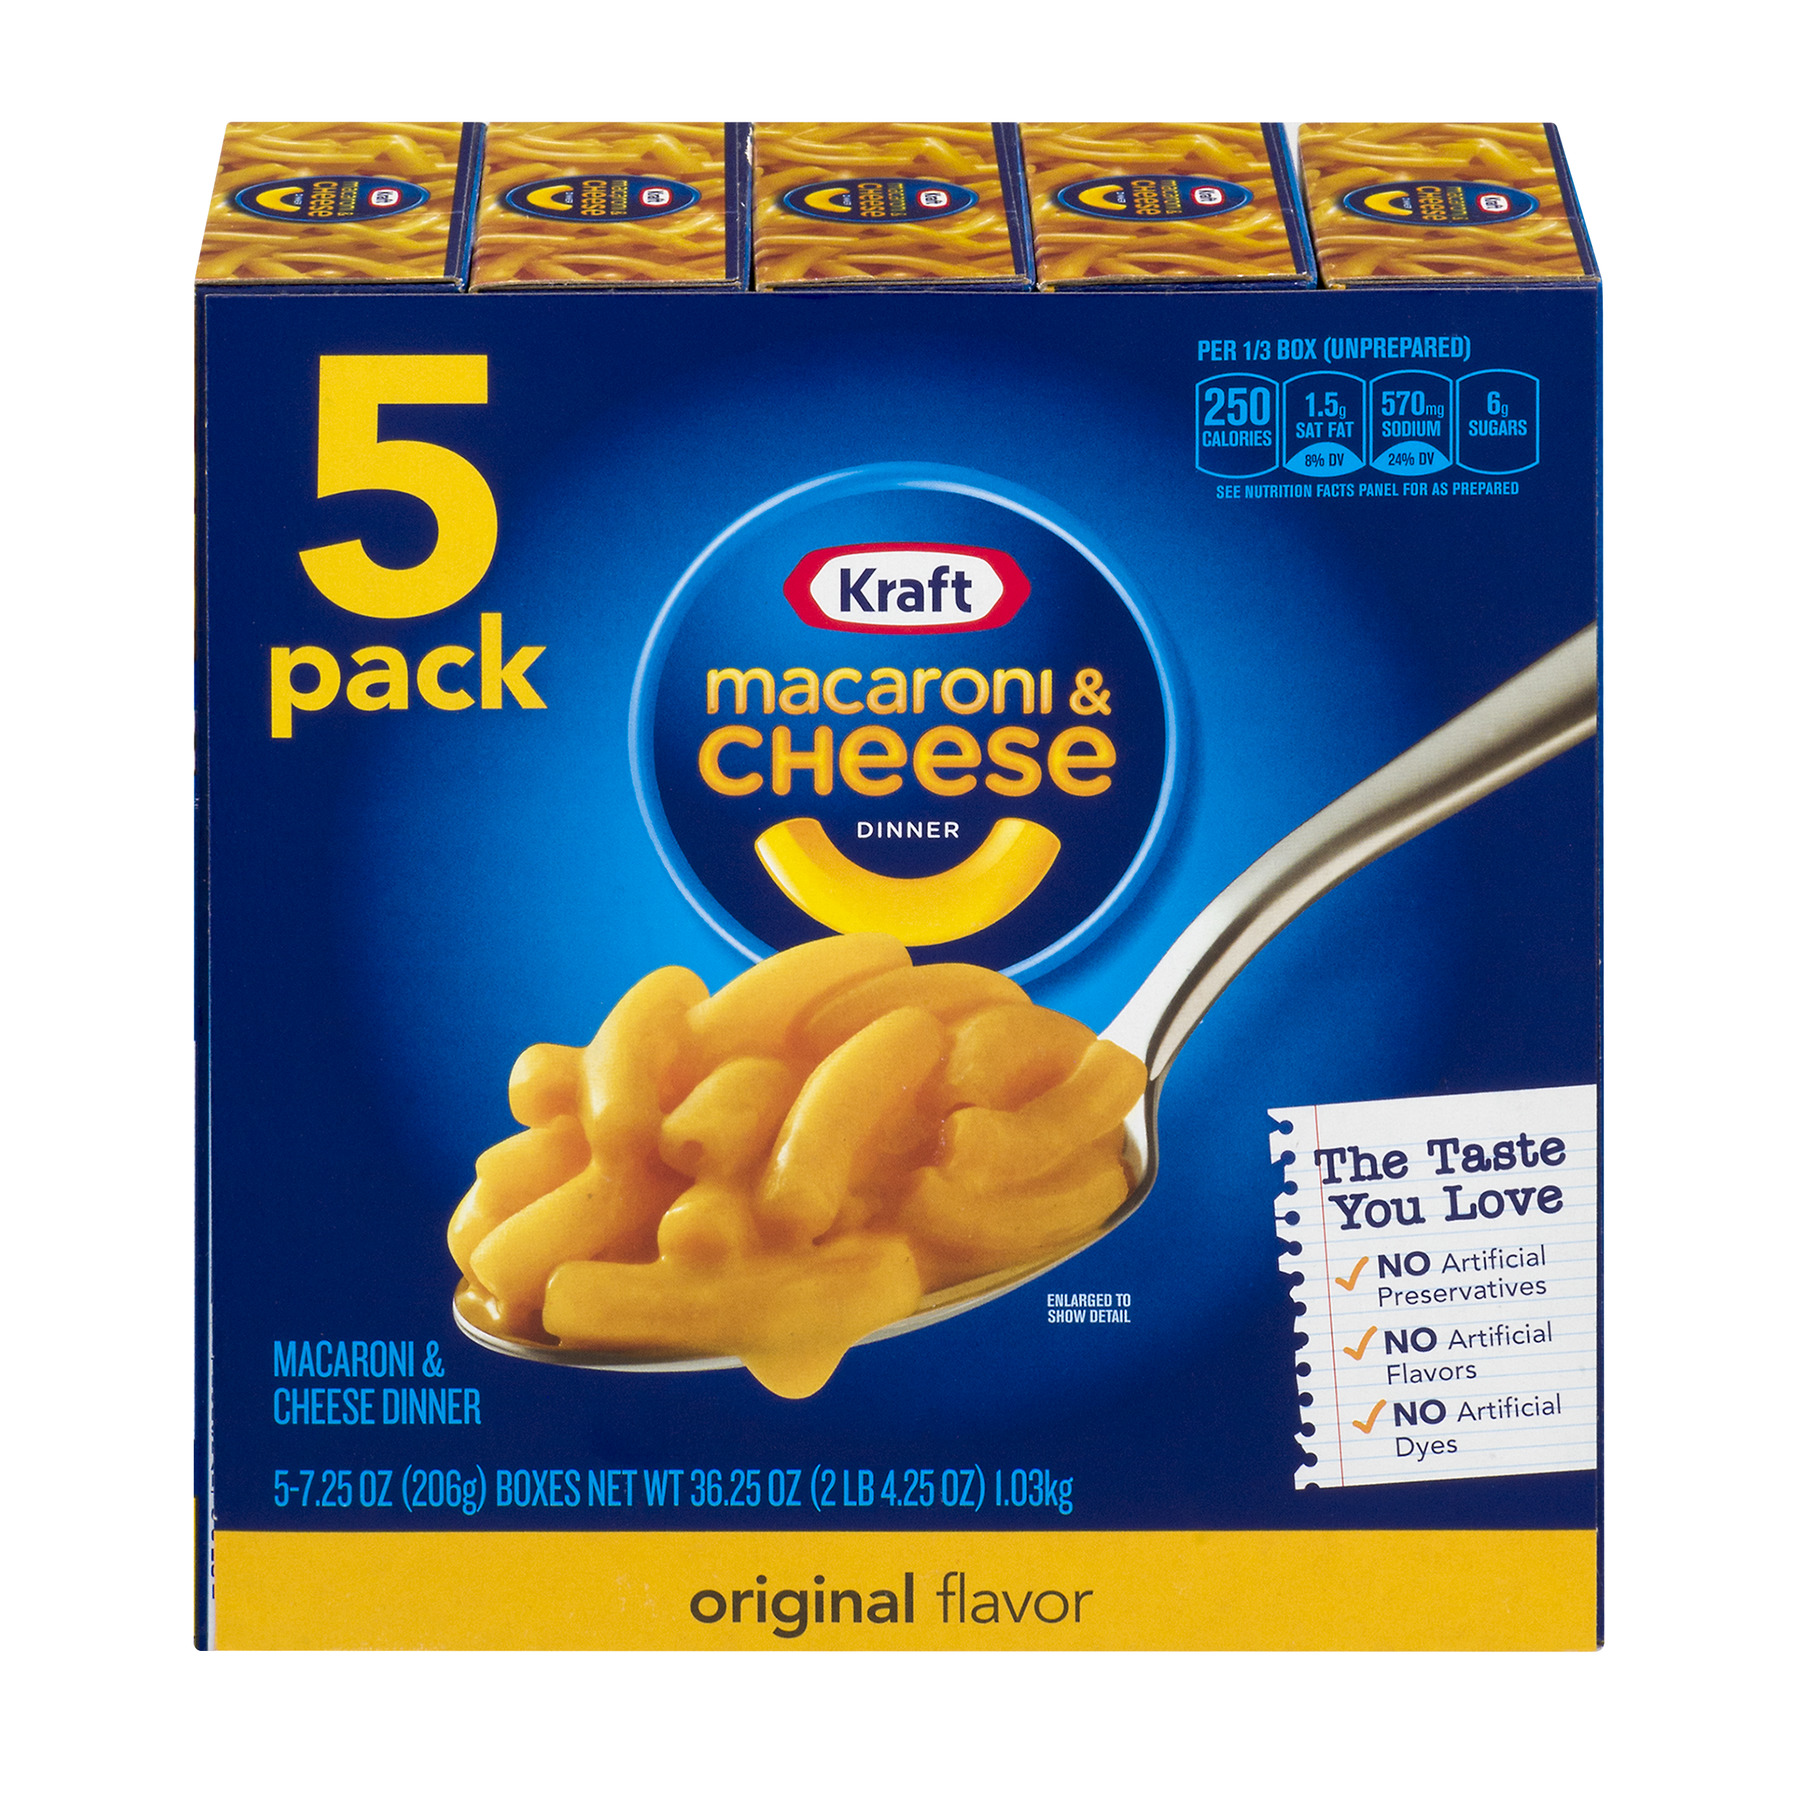 Kraft Macaroni & Cheese Dinner Original Flavor, 5 count , 36.25 oz